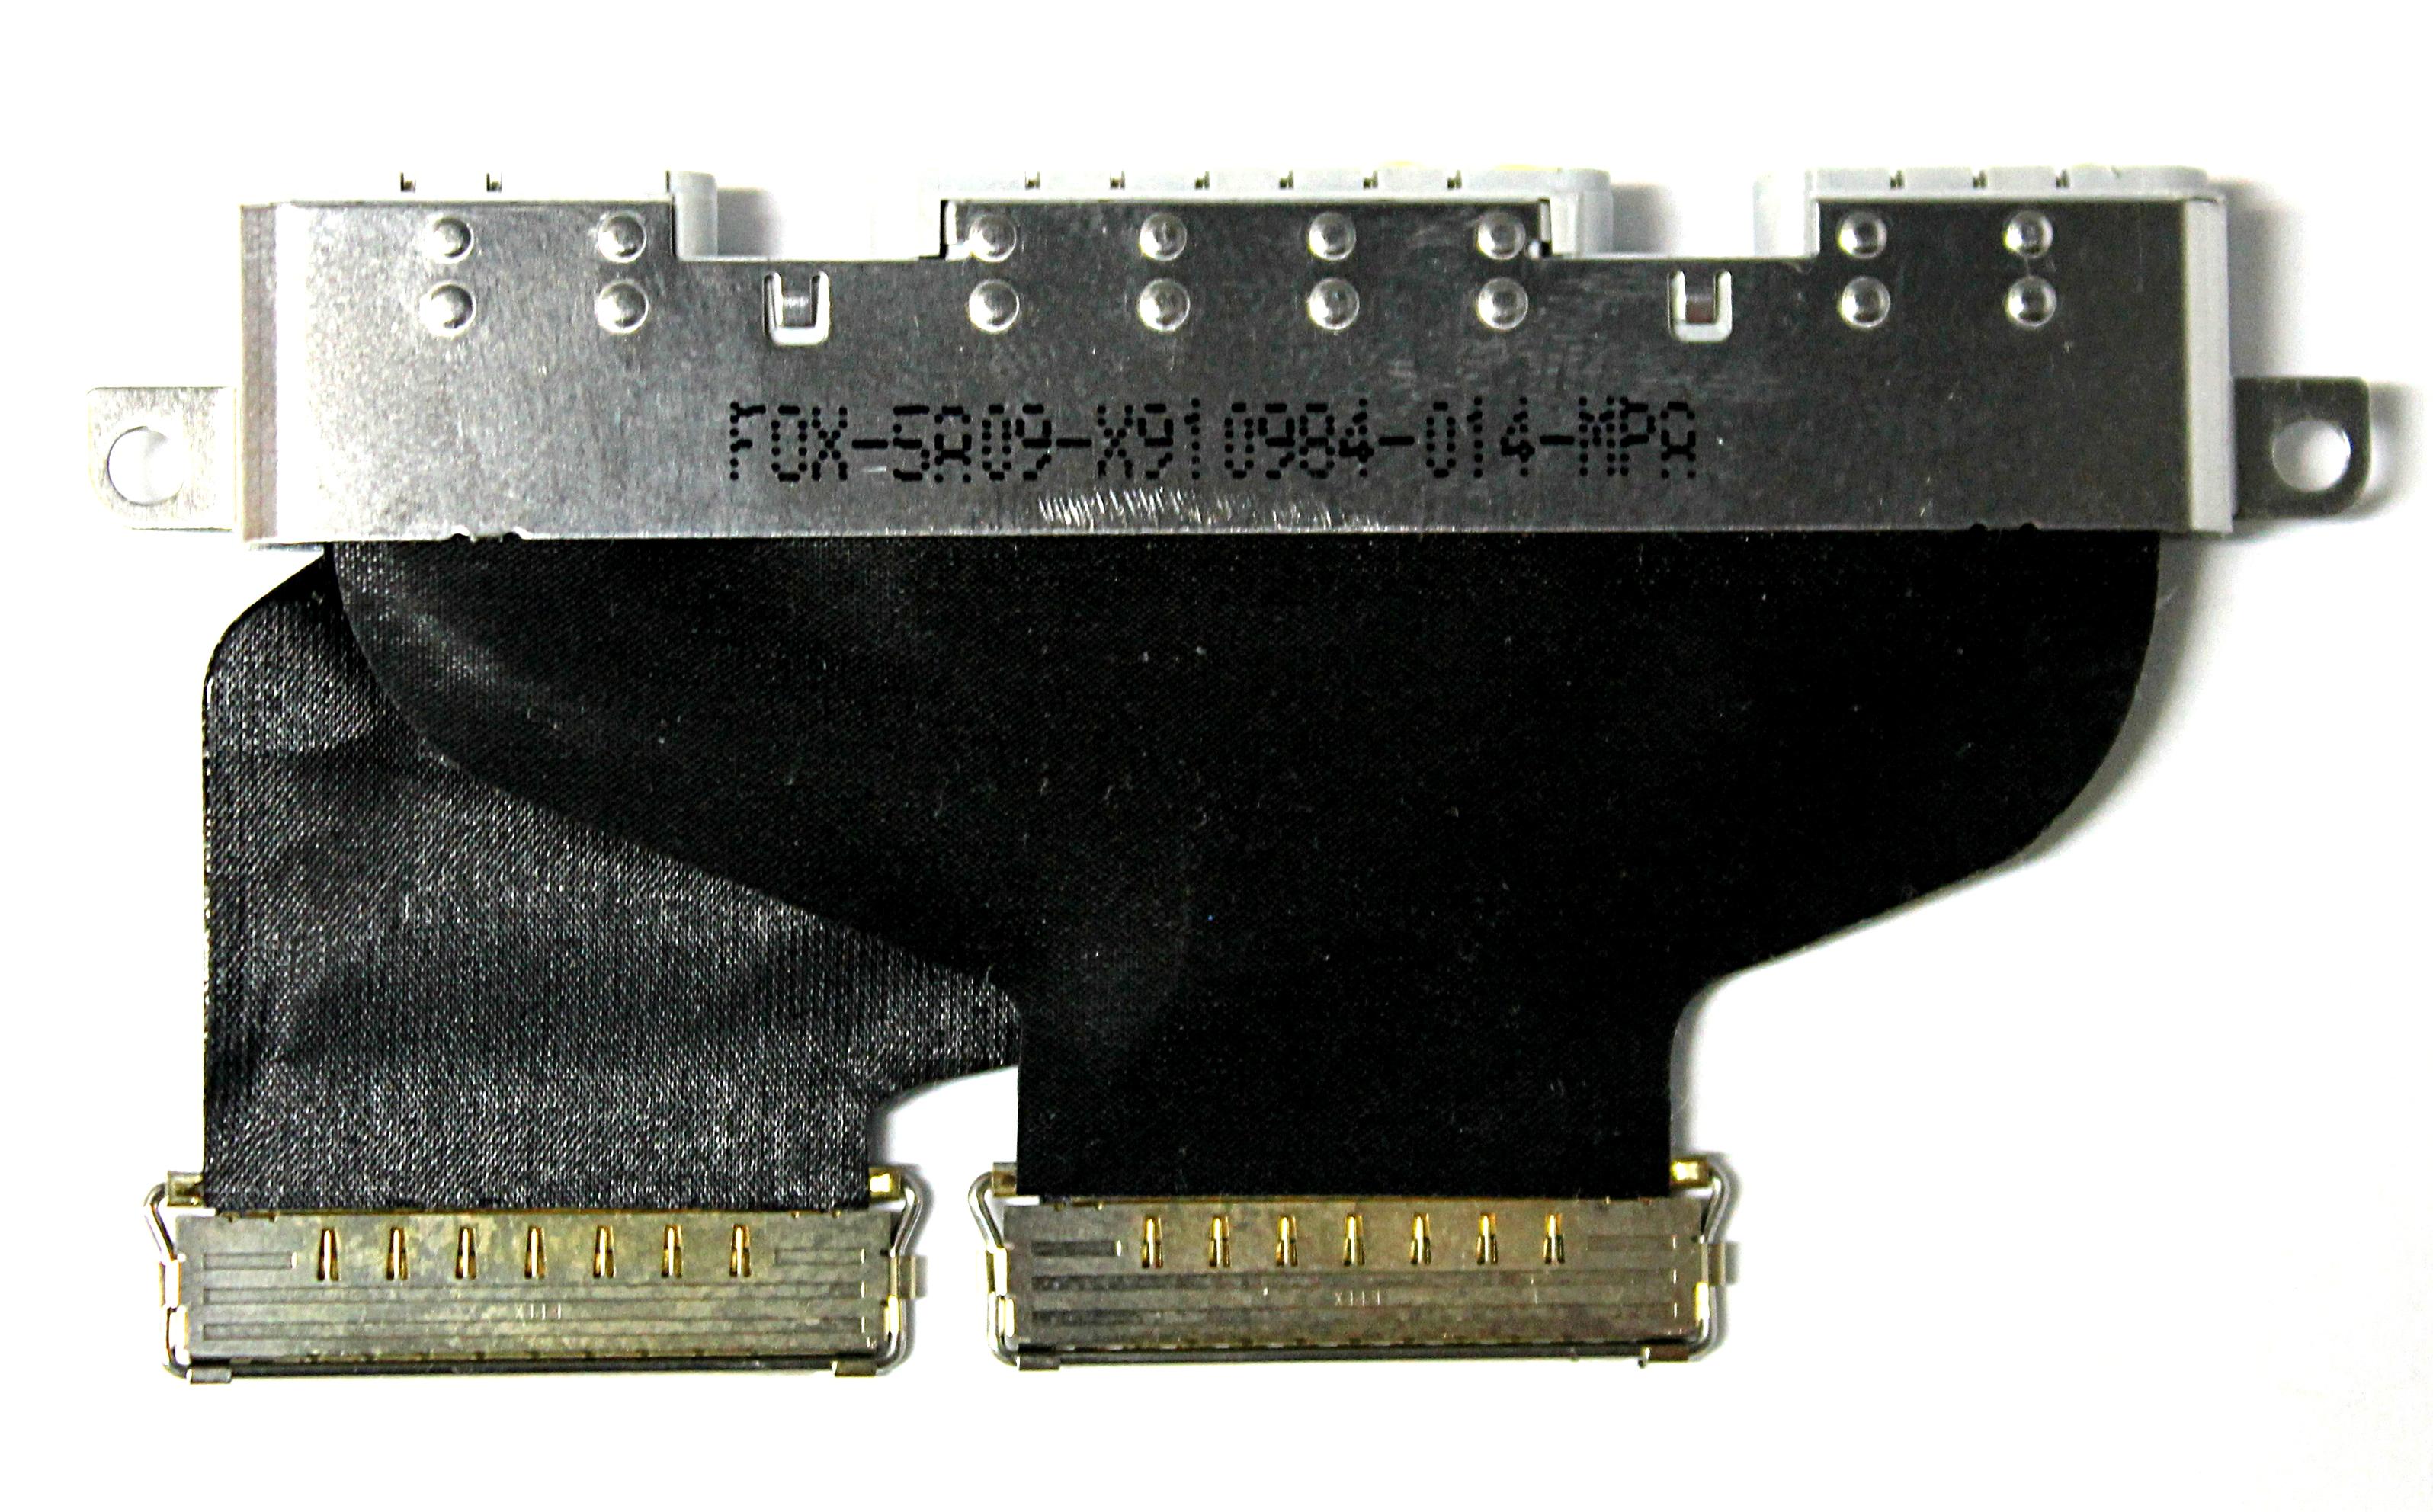 Connettori a spina beige,18 pin,terminali dritti,alimentazione PCB ATX,5 pezzi